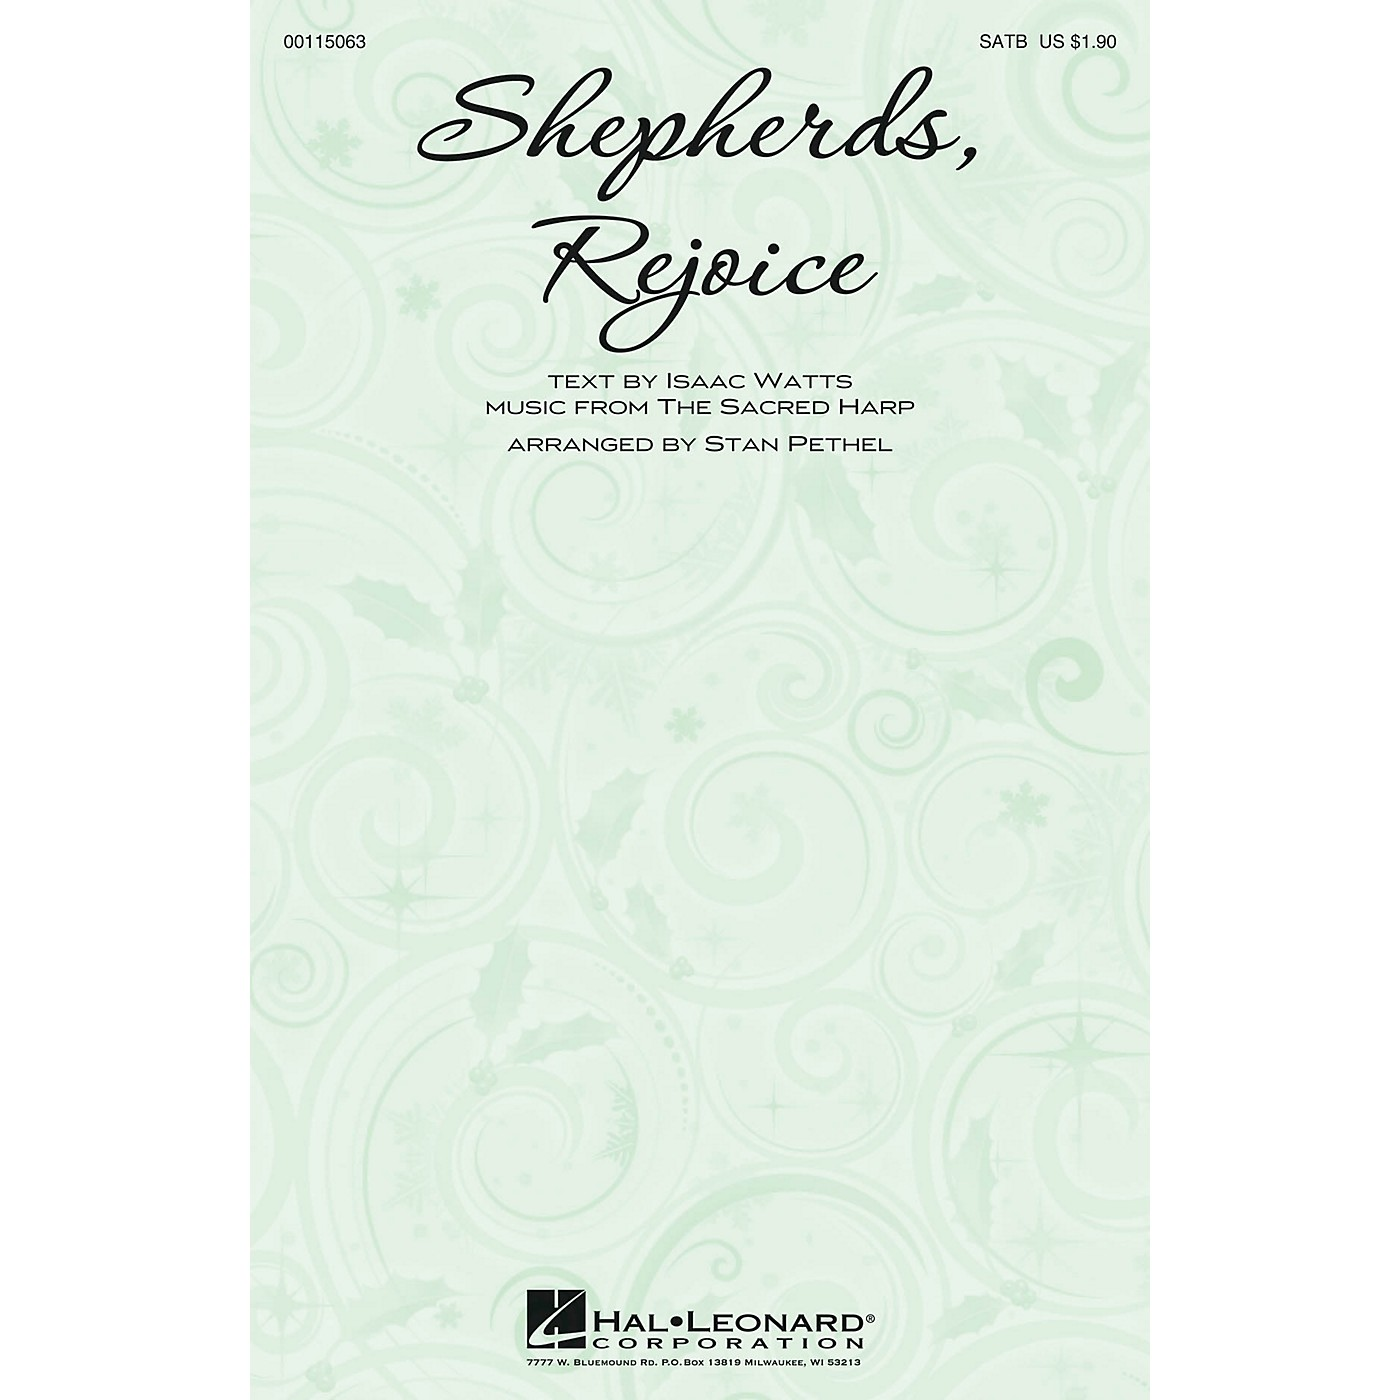 Hal Leonard Shepherds, Rejoice SATB arranged by Stan Pethel thumbnail